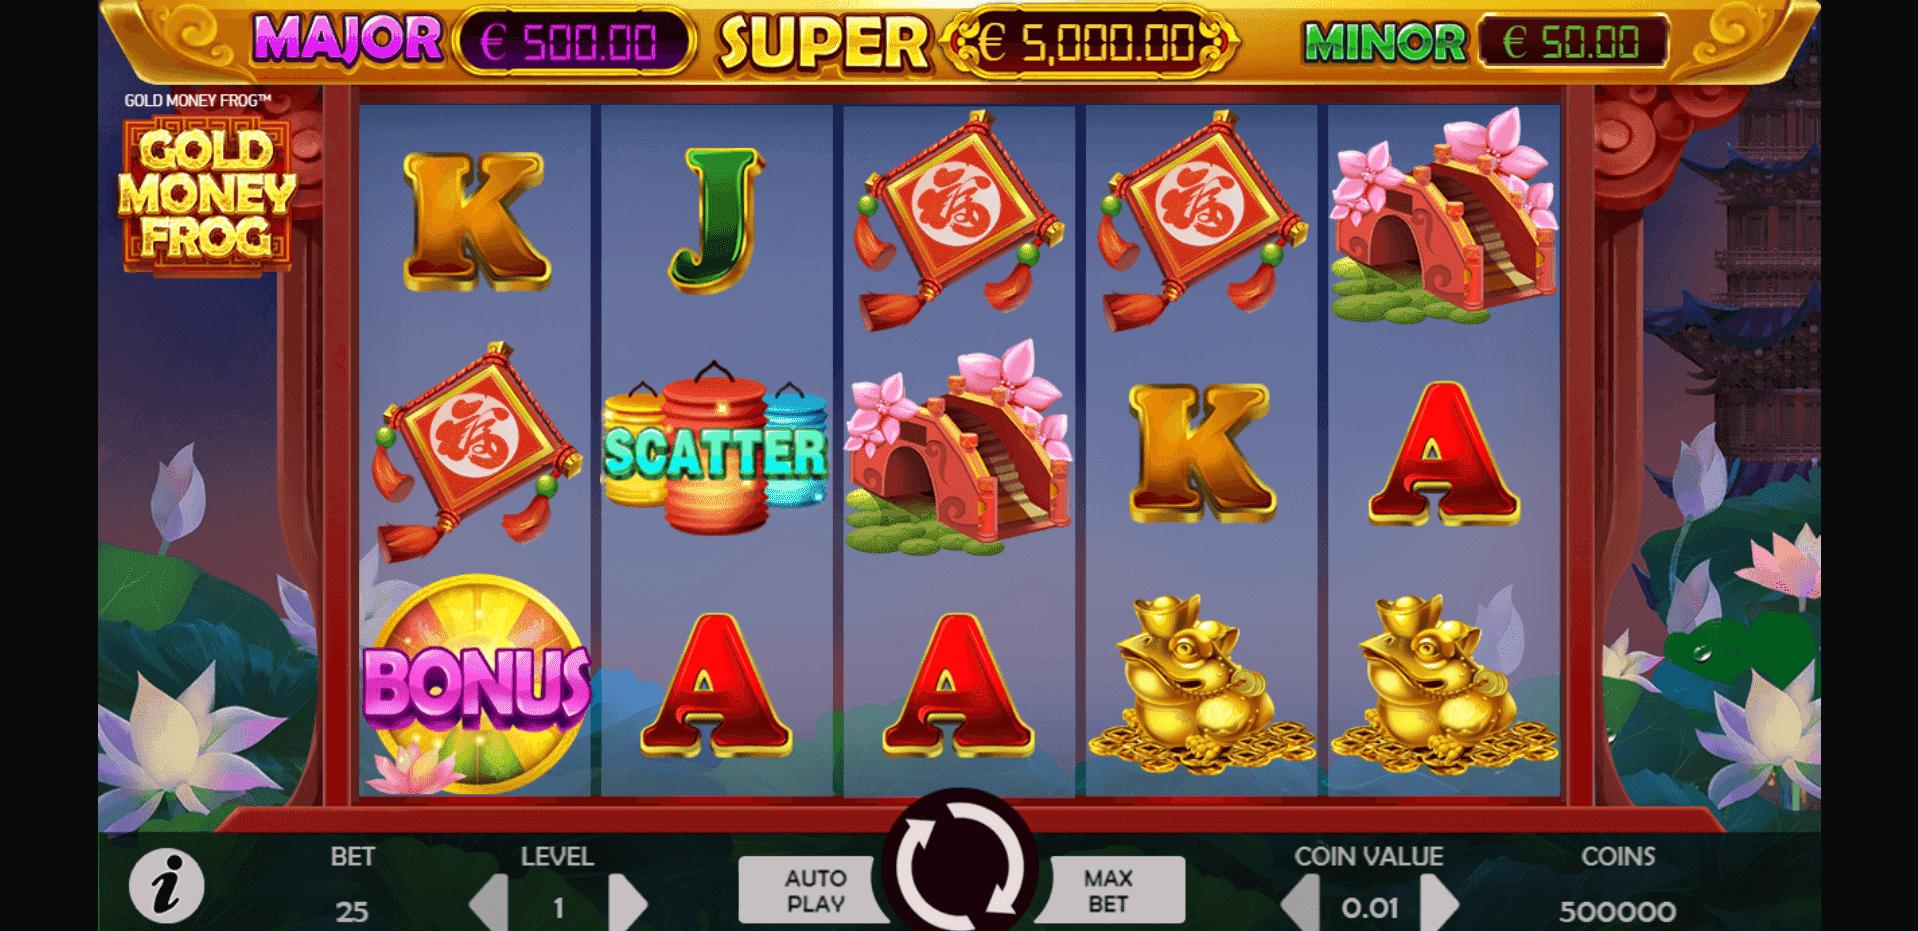 Gold Money Frog slot machine screenshot